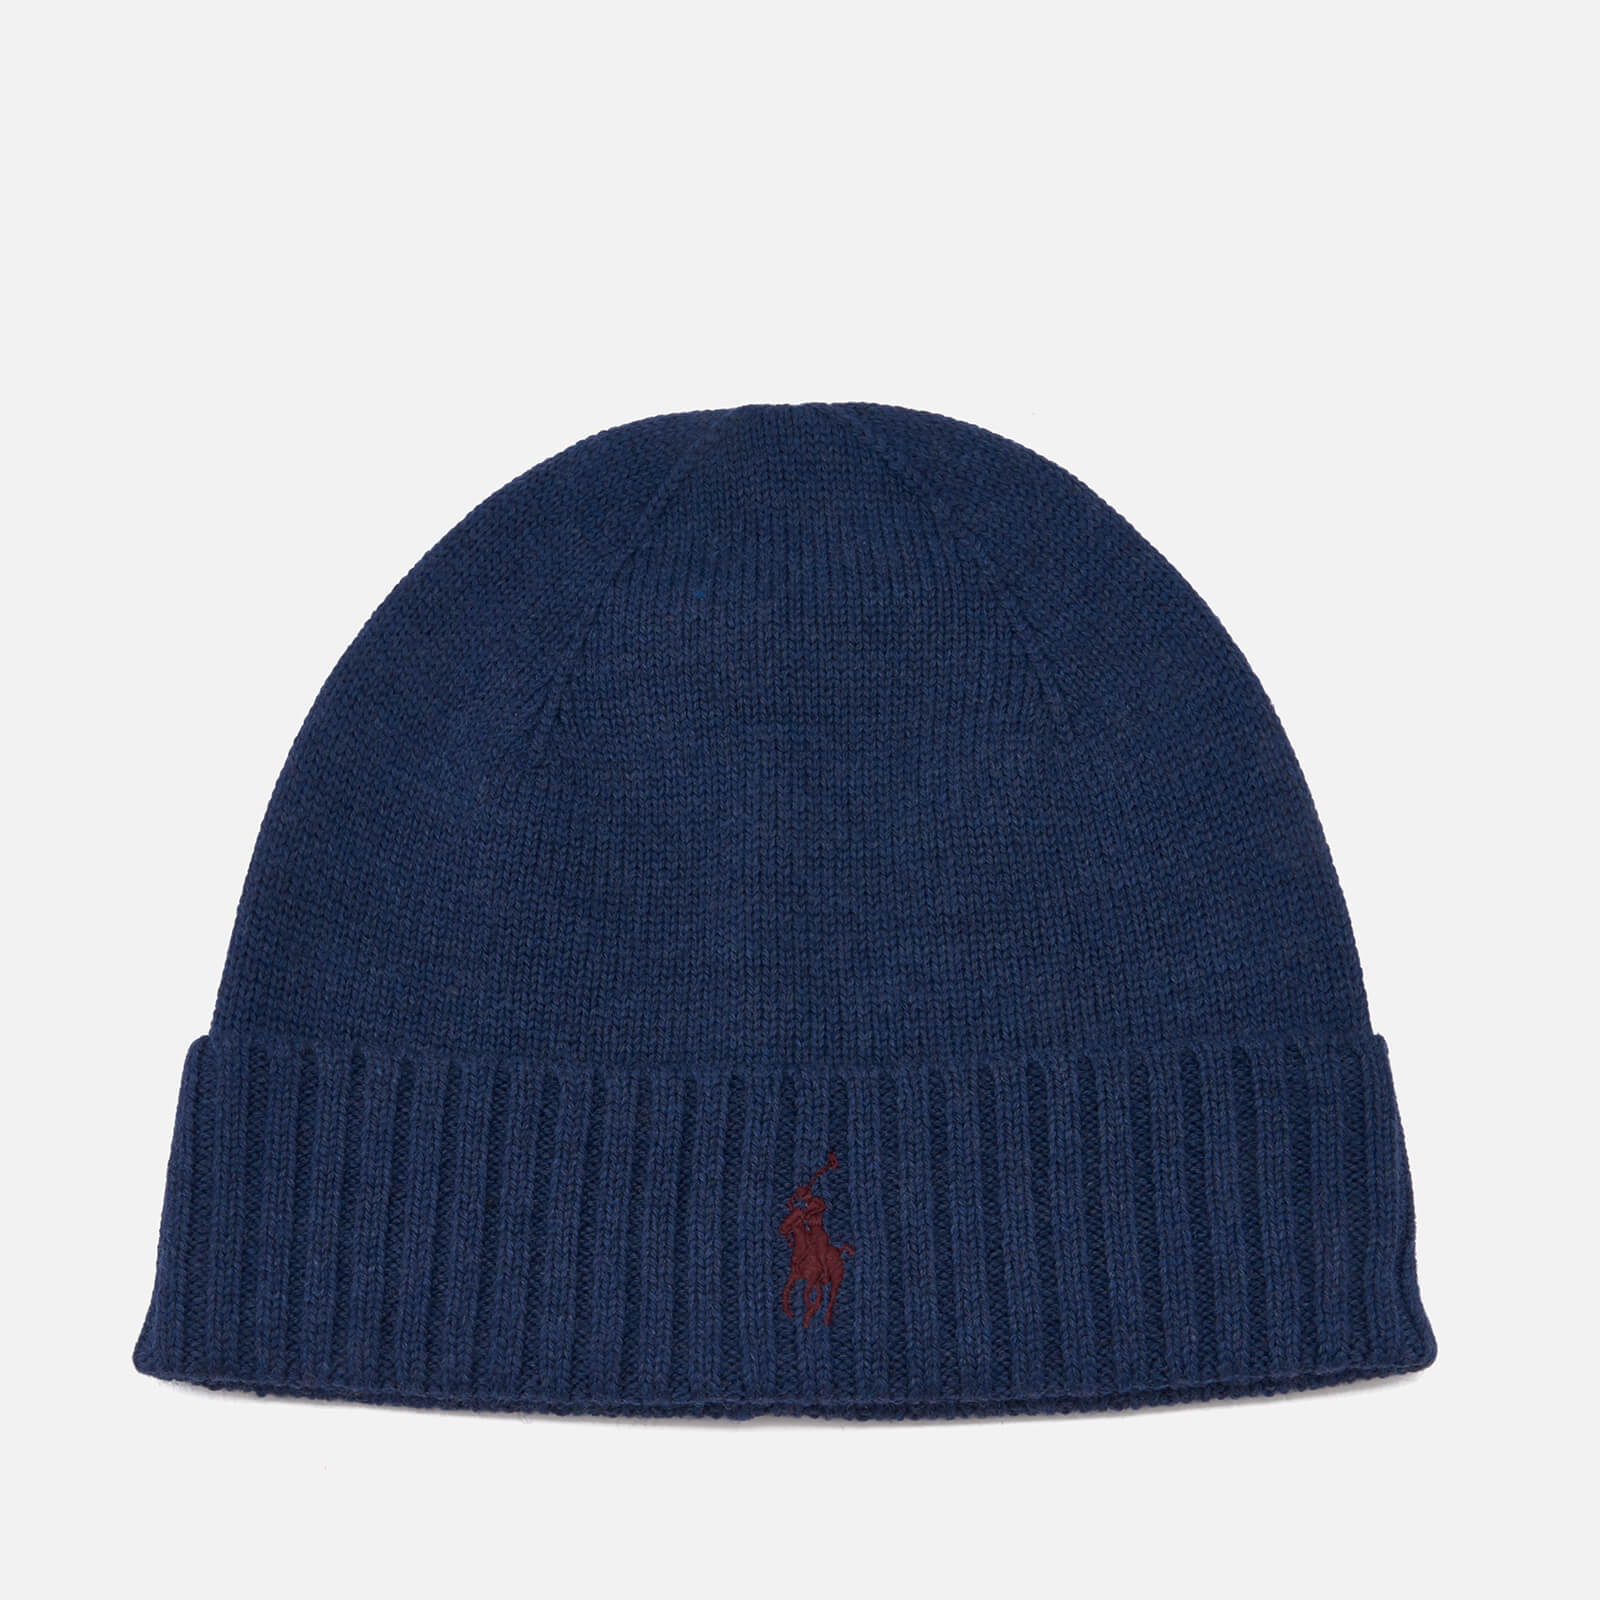 175fce644 Polo Ralph Lauren Men's Merino Wool Beanie Hat - Shale Blue Heather